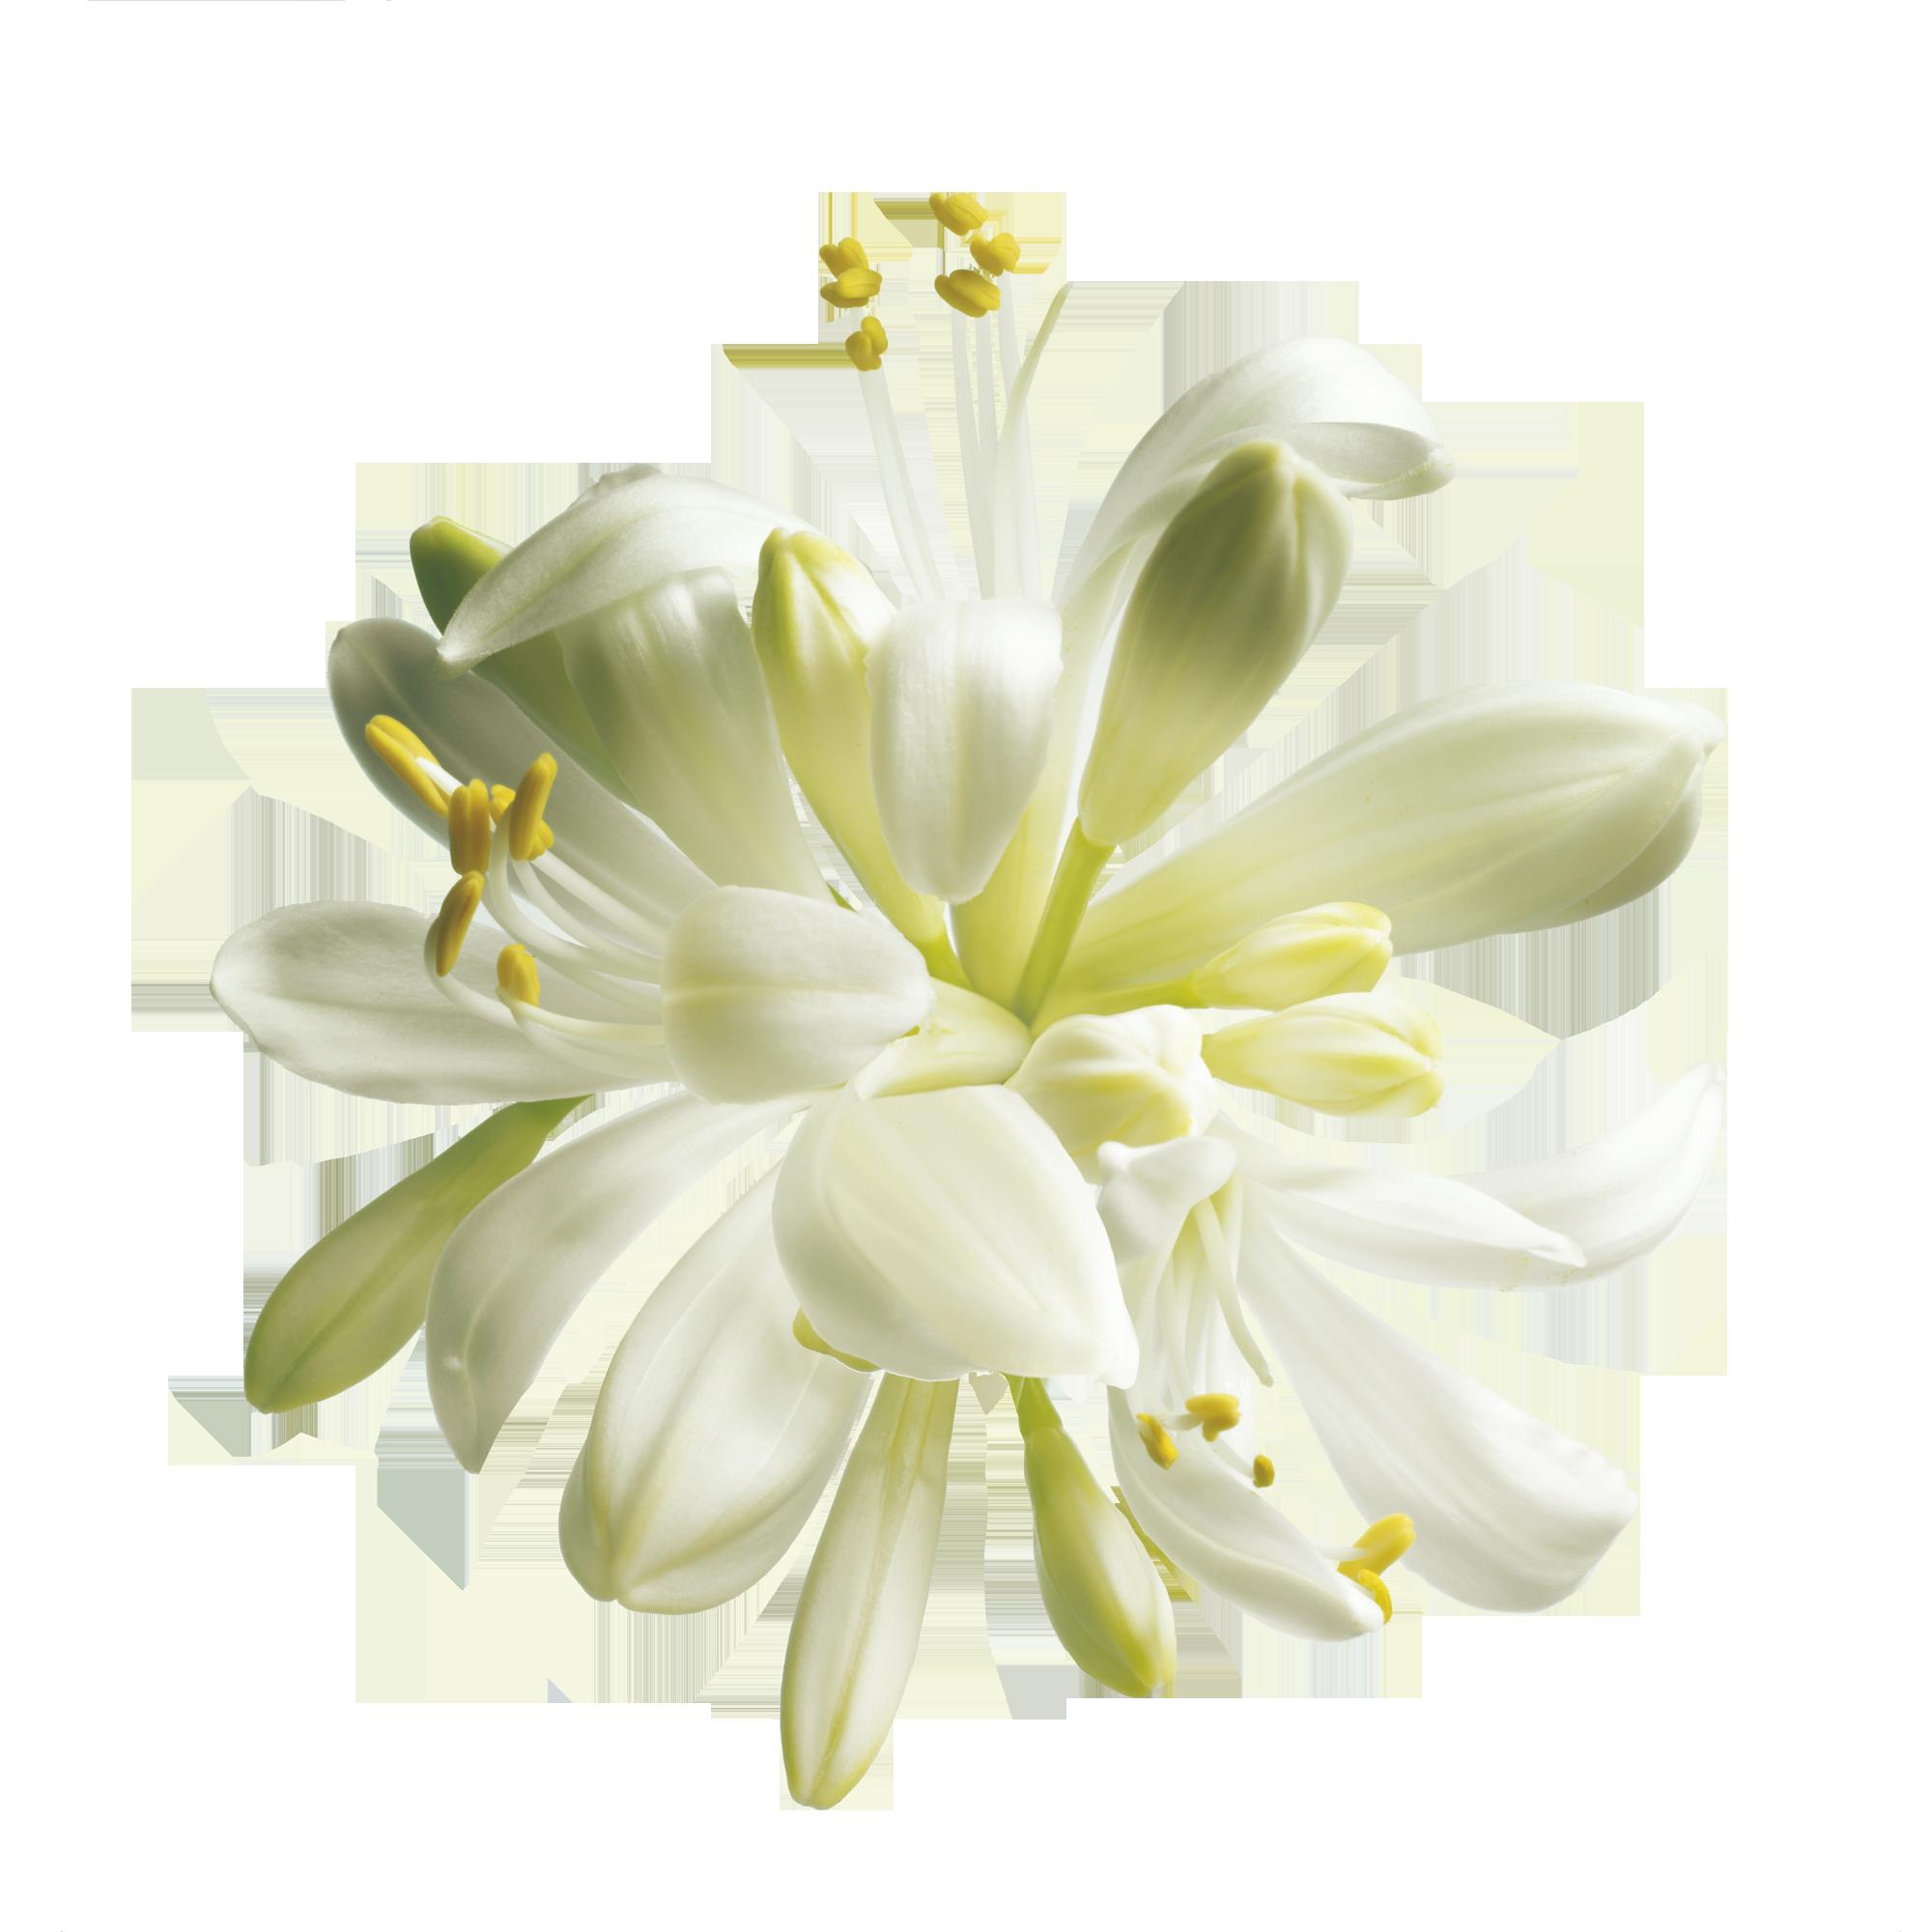 Moringa Moringa tree, Moringa, Flower